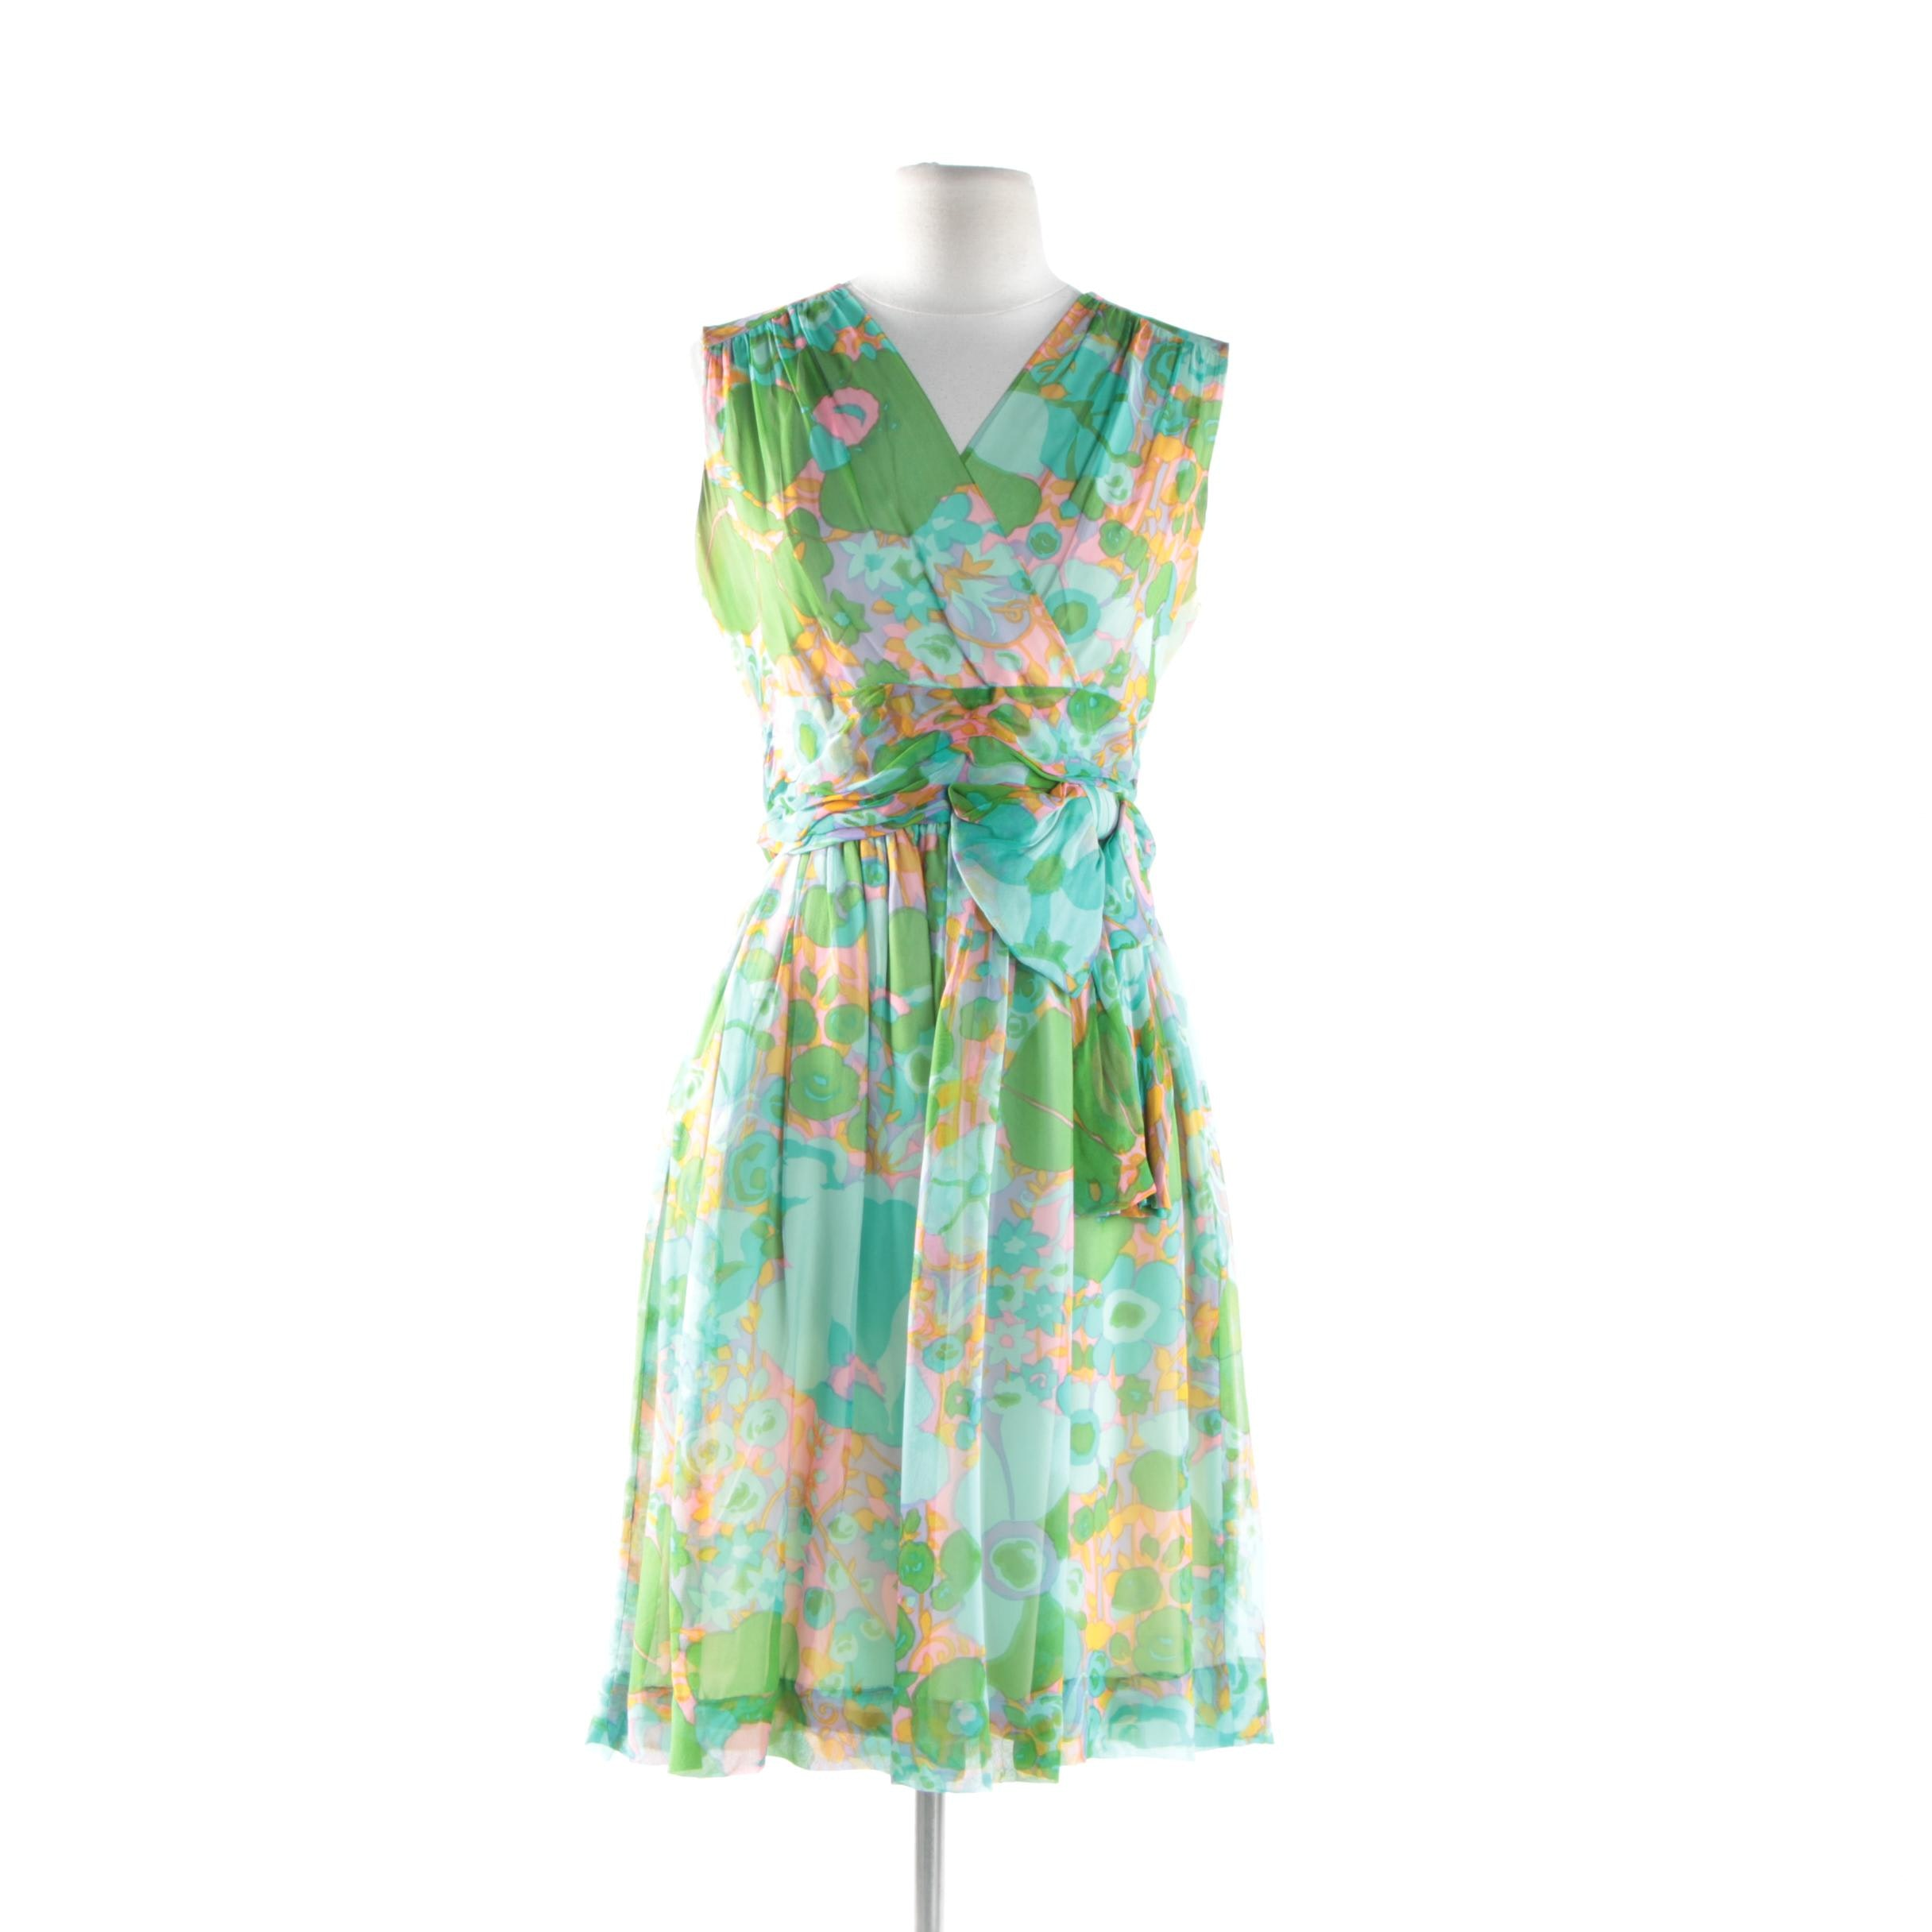 Women's Circa 1960s Suzy Perette Green Silk Chiffon Floral Print Midi Dress